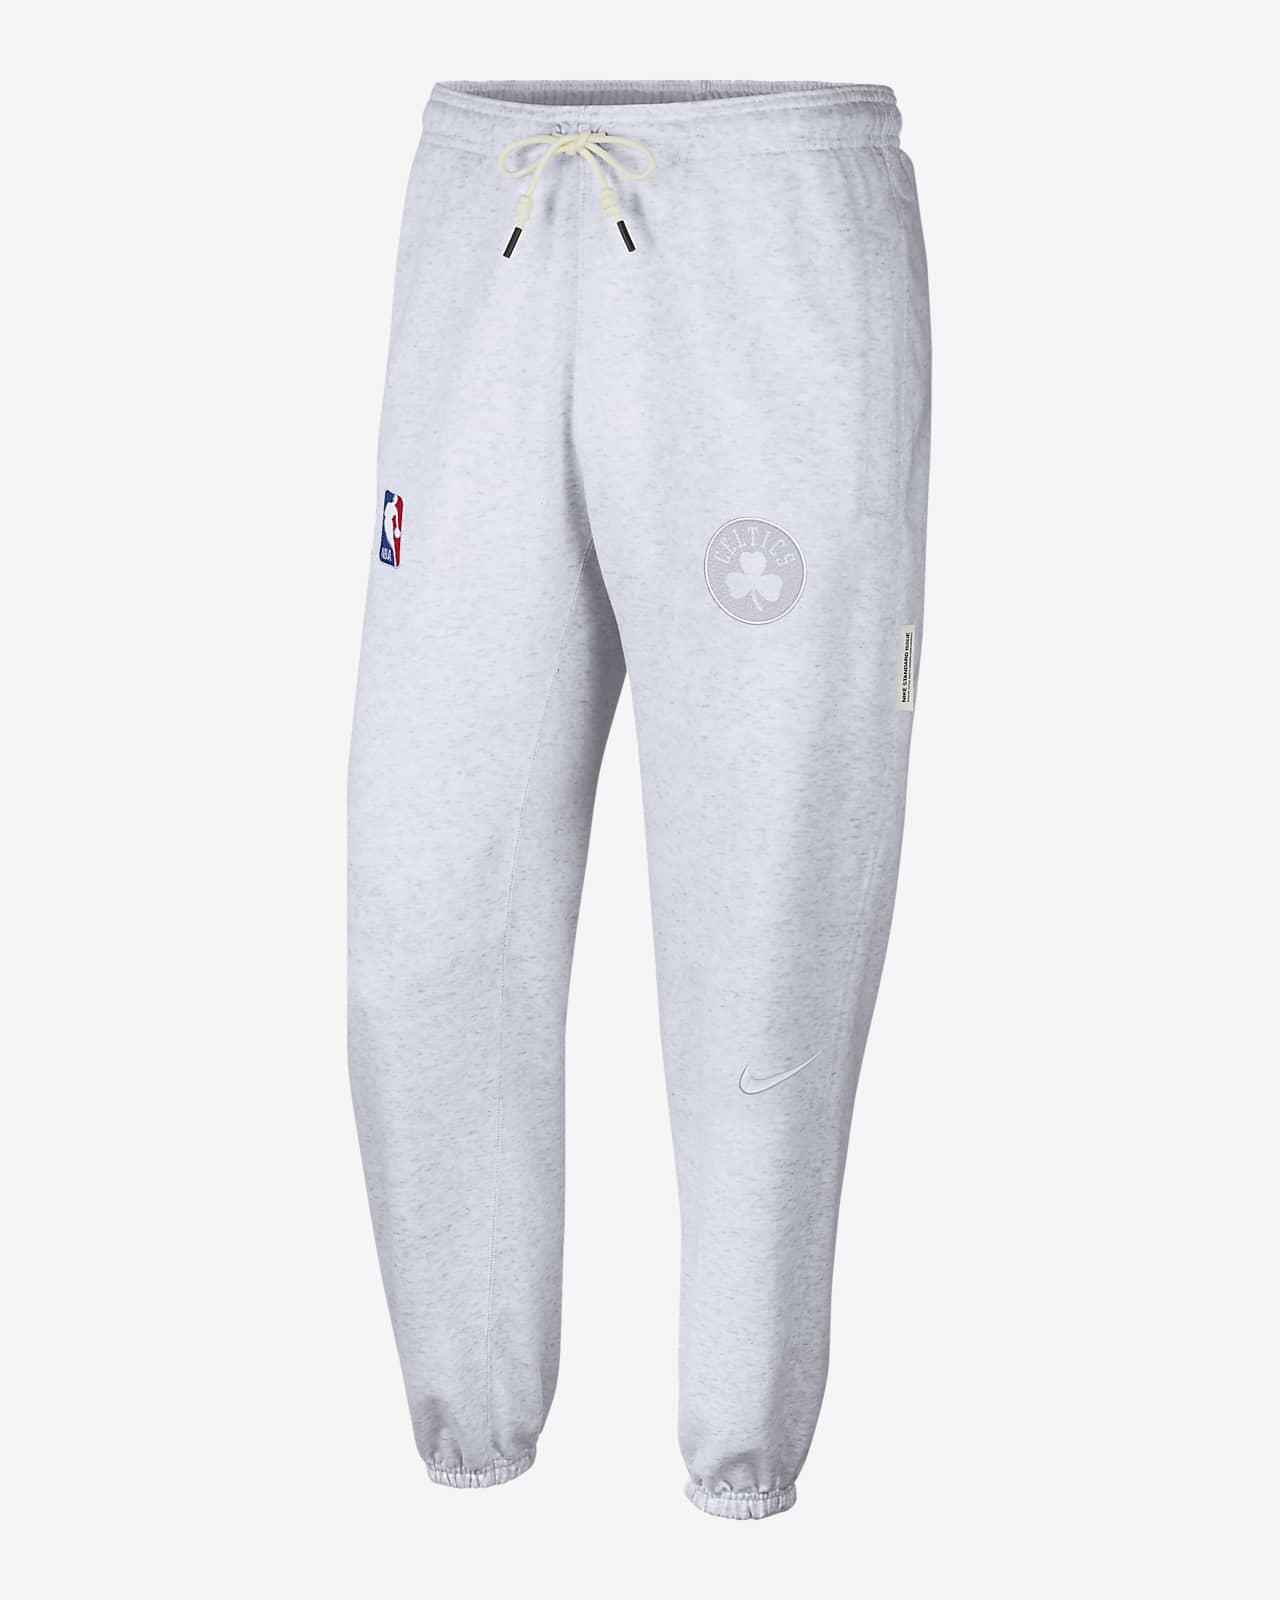 Boston Celtics Standard Issue Men's Nike Dri-FIT NBA Trousers